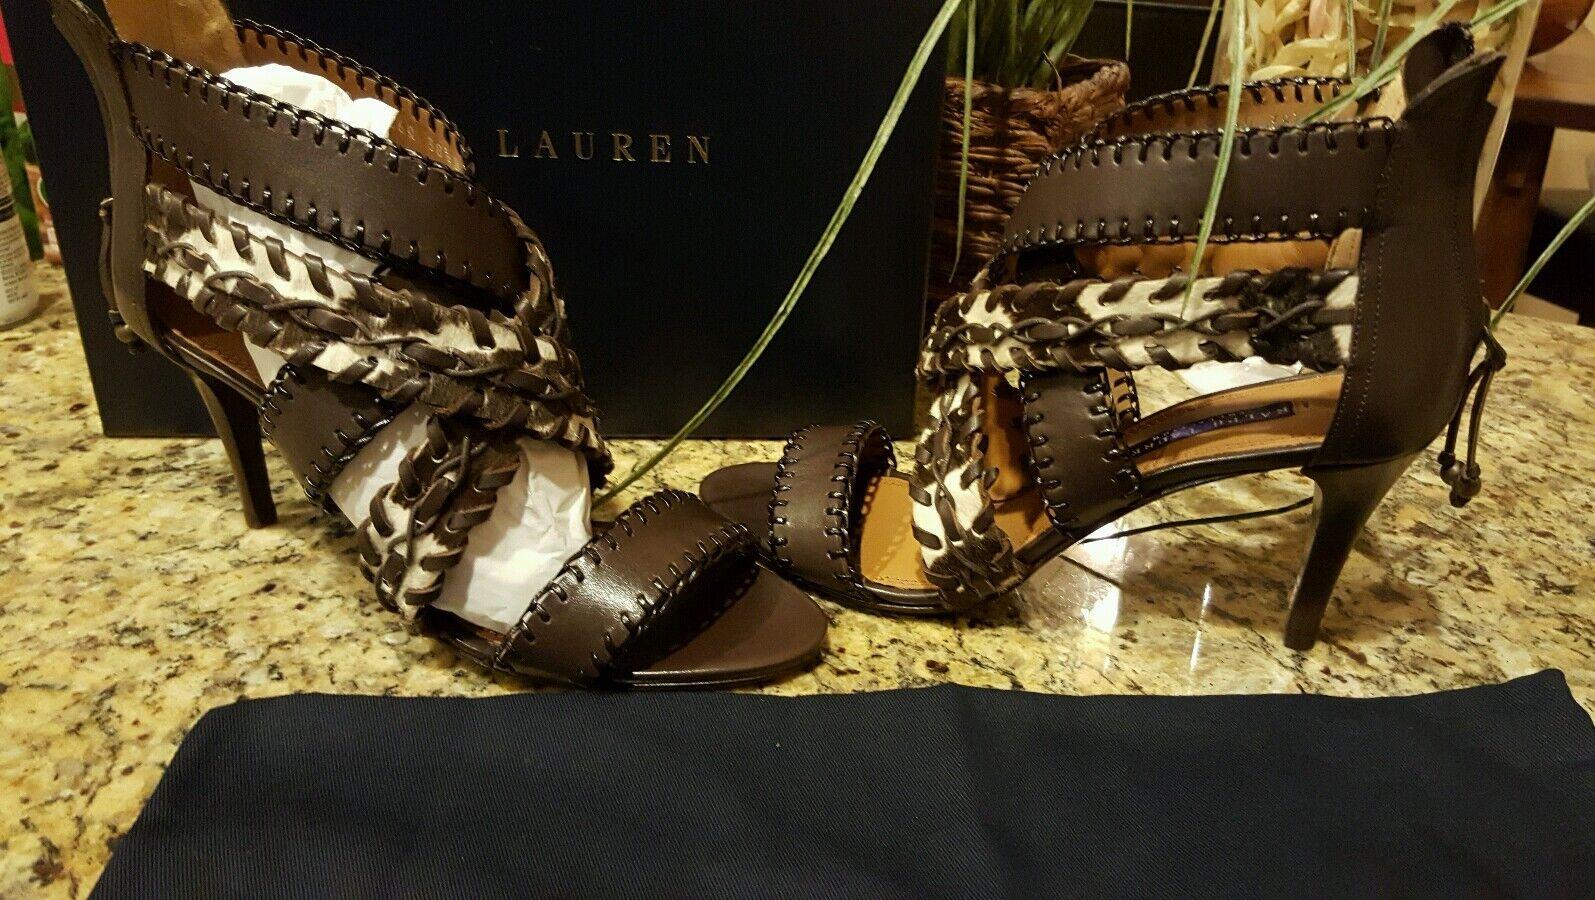 negozio fa acquisti e vendite Ralph Lauren viola Label donna Ardina Zebra Hair Sandals Sz Sz Sz 38.5 THESPOT917  punti vendita